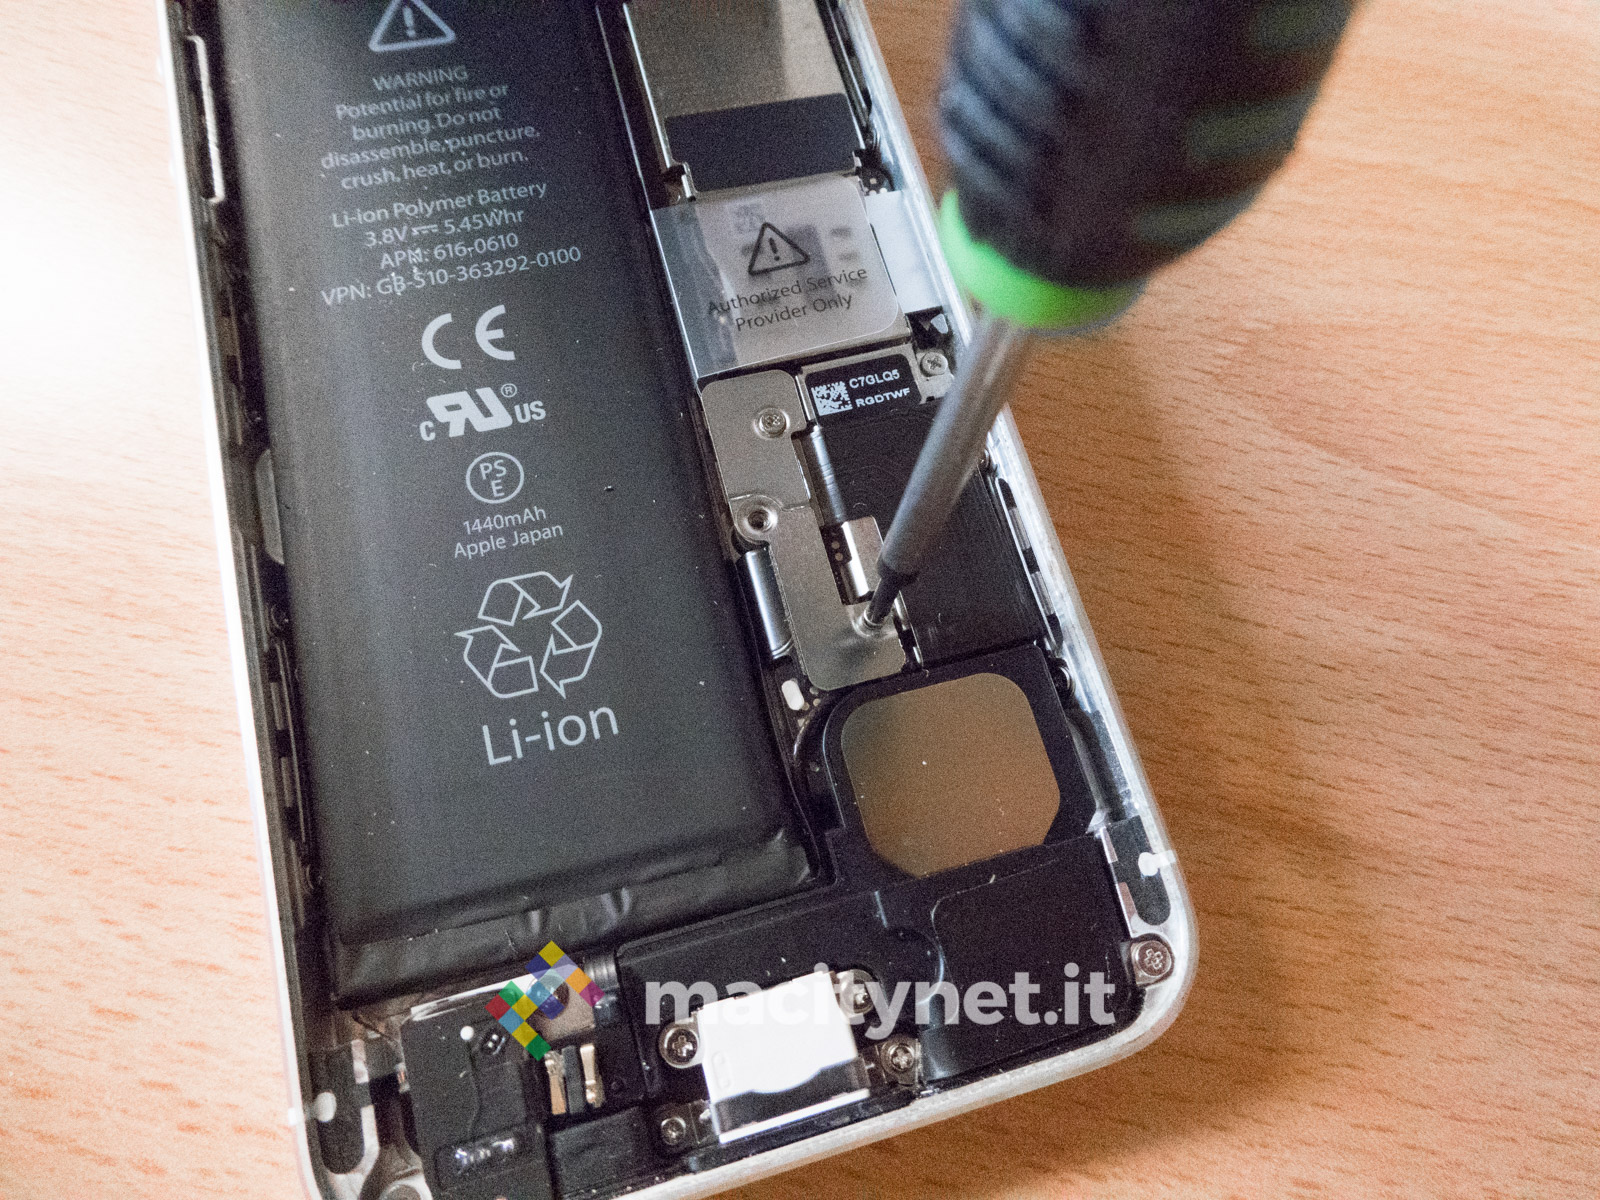 Recensione GIGA Fixxoo BATTERIA iPhone 5s, iPhone 4, iPhone 6 come sostituire